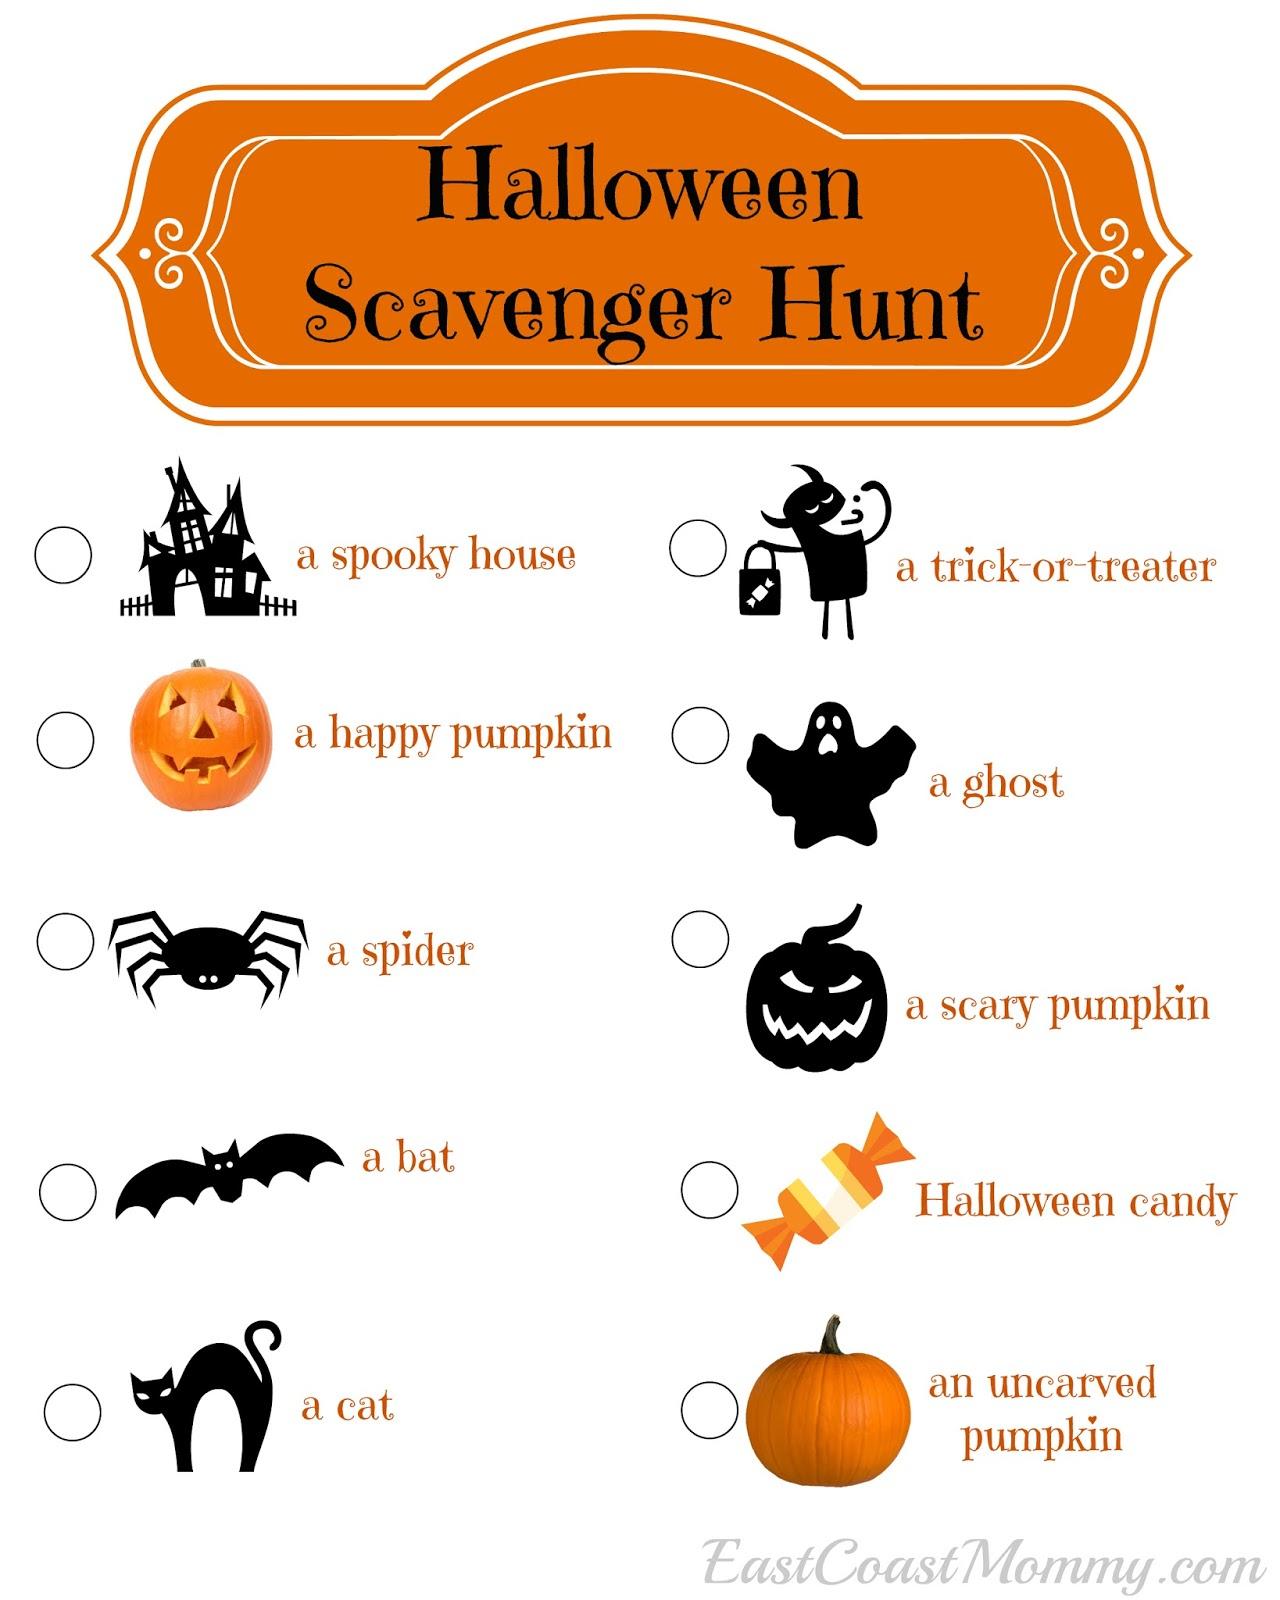 East Coast Mommy: Halloween Scavenger Hunt (With Free Printable) - Free Printable Halloween Scavenger Hunt